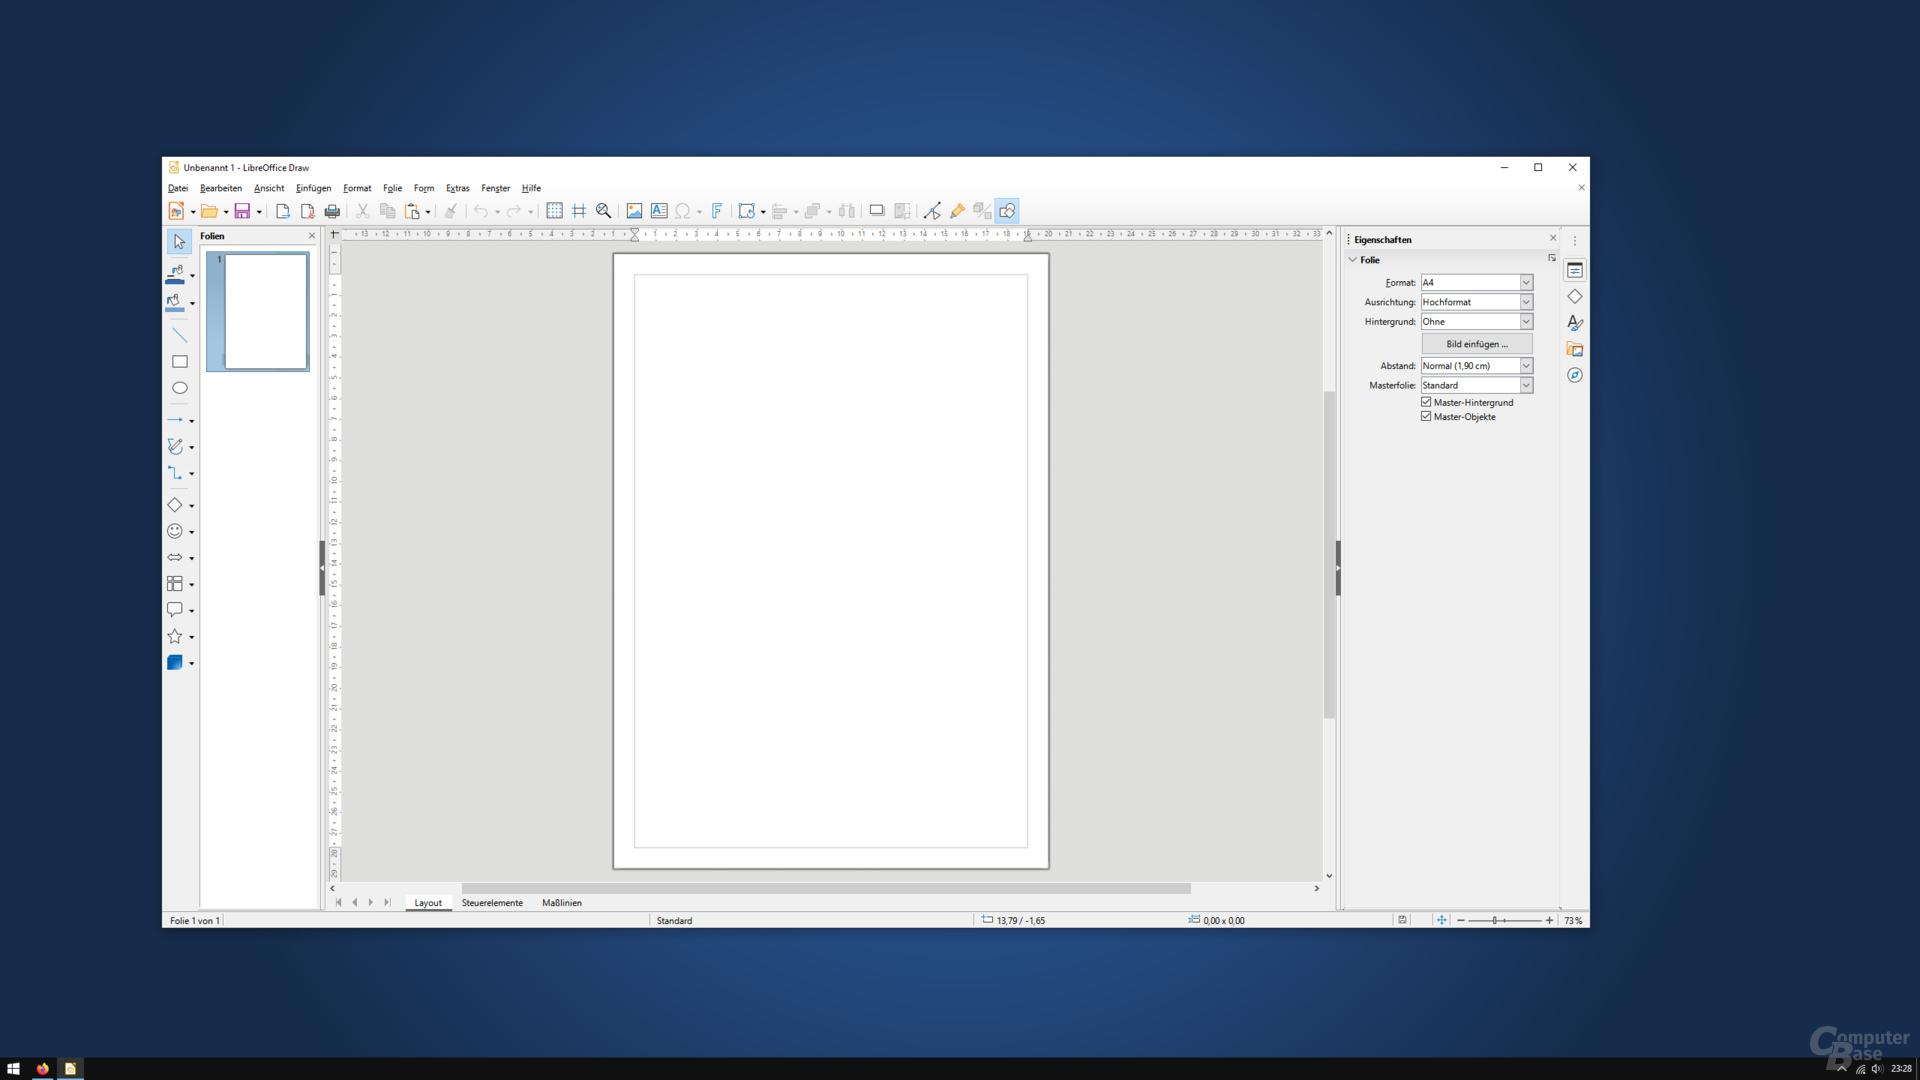 LibreOffice 7.0.0.3 – Draw